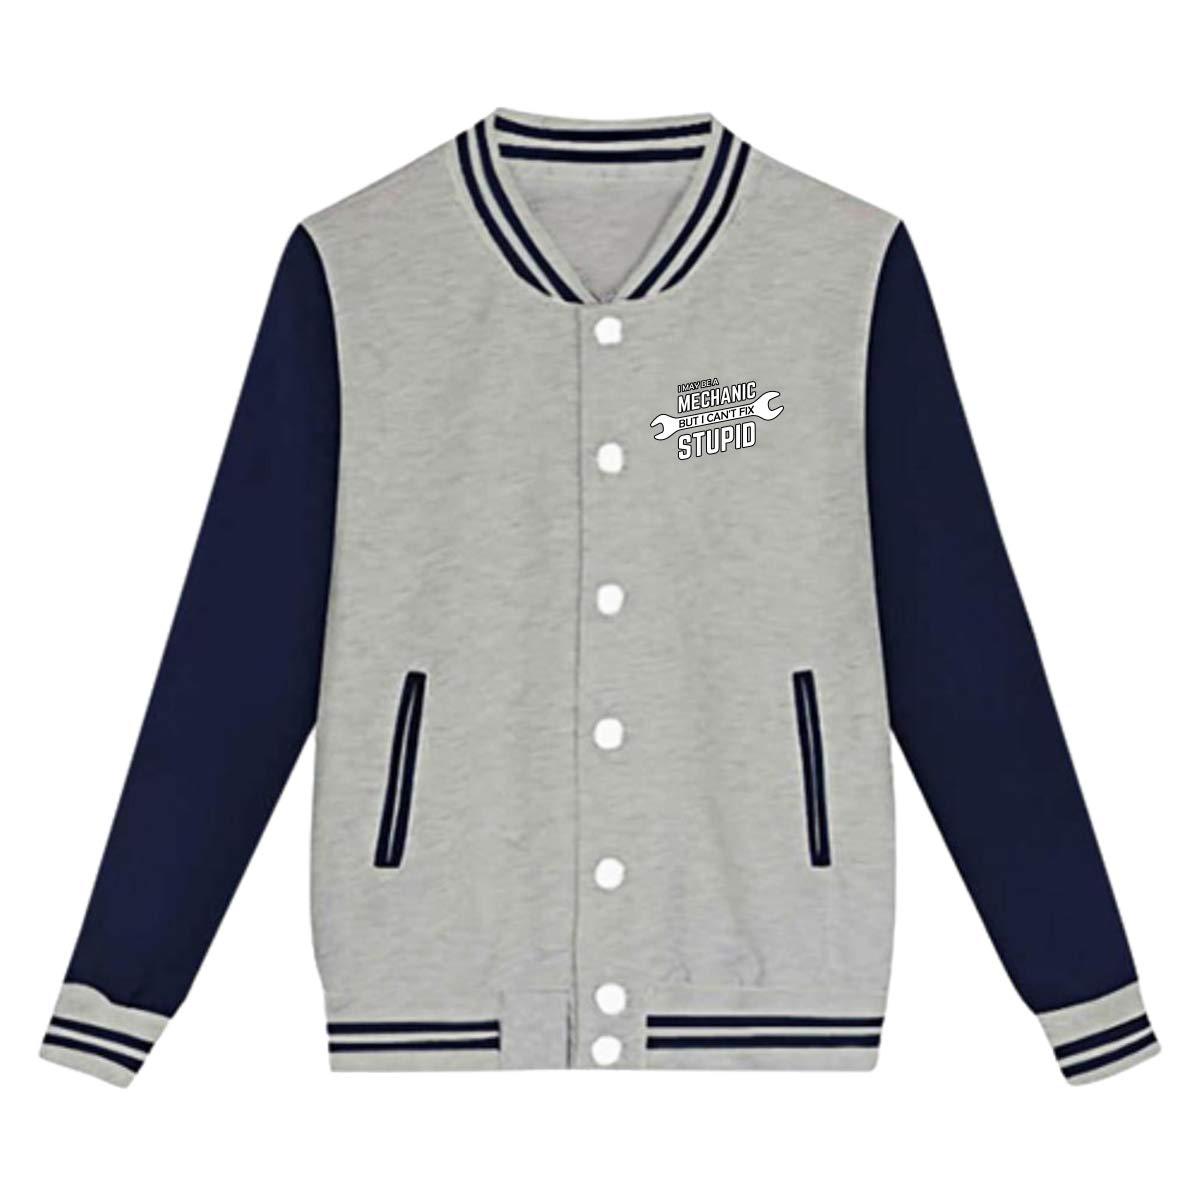 Tina TN I May Be A Mechanic But I Cant Fix Stupid Teens Boys Girl Varsity Baseball Jacket Long Sleeve Sport Baseball Uniform Jacket Coat Sweater Black